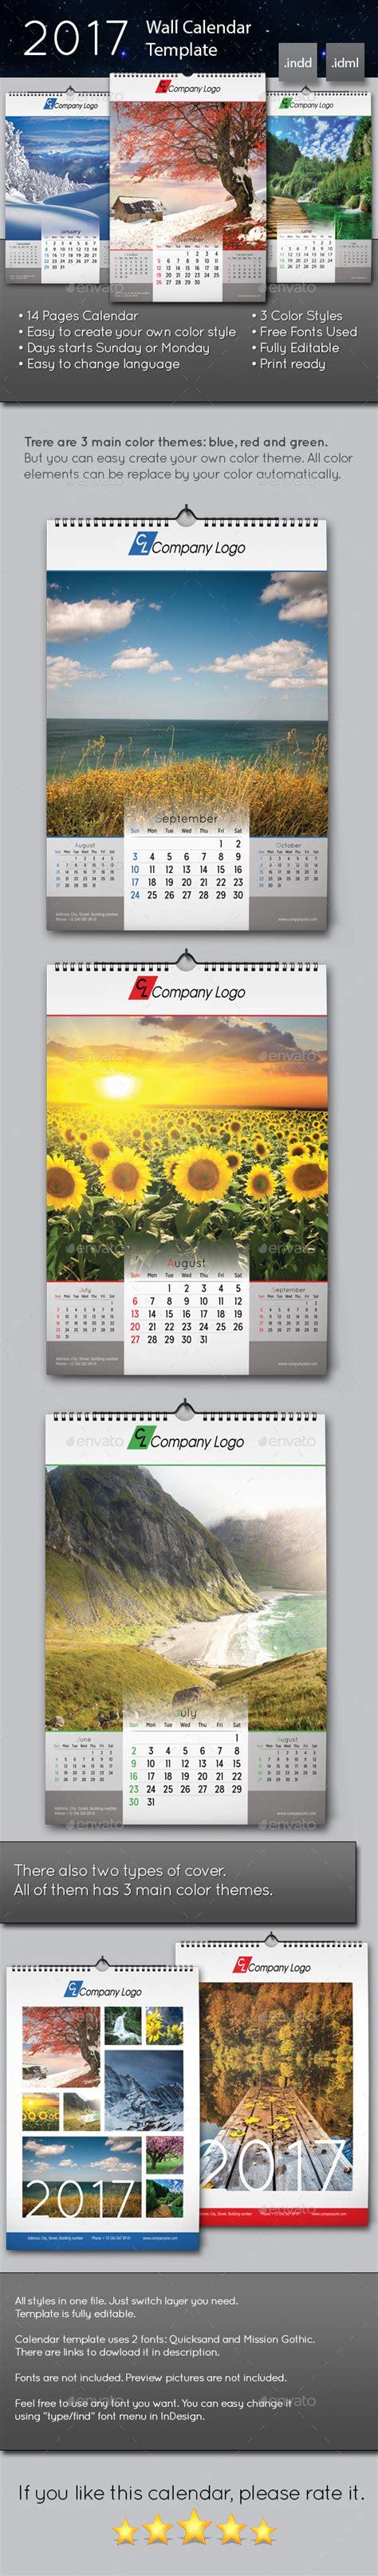 calendar layout indesign 2018 wall calendar wall calendars template and 2017